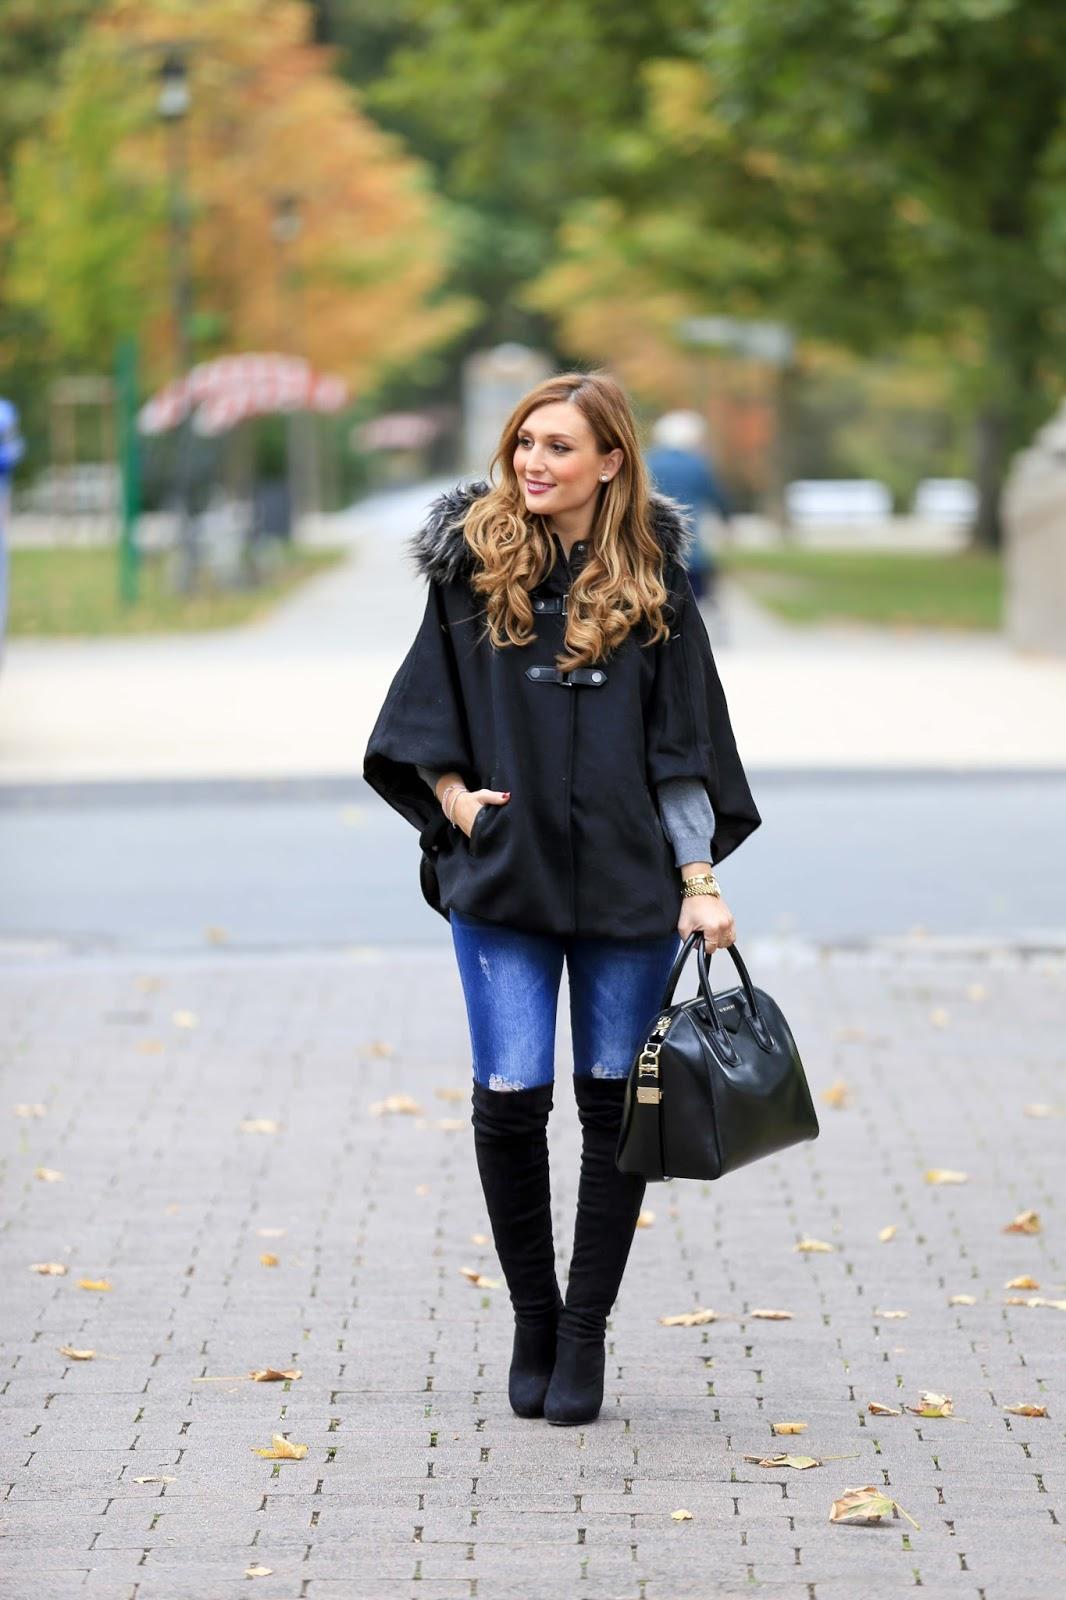 Streetstyle-Blogger-Streetstyle-Look-Poncho kombinieren -Blogger Herbstlook- Winterlook-inspirationen - was-zieht-man-im-Winter- an- schwarzerPonchos